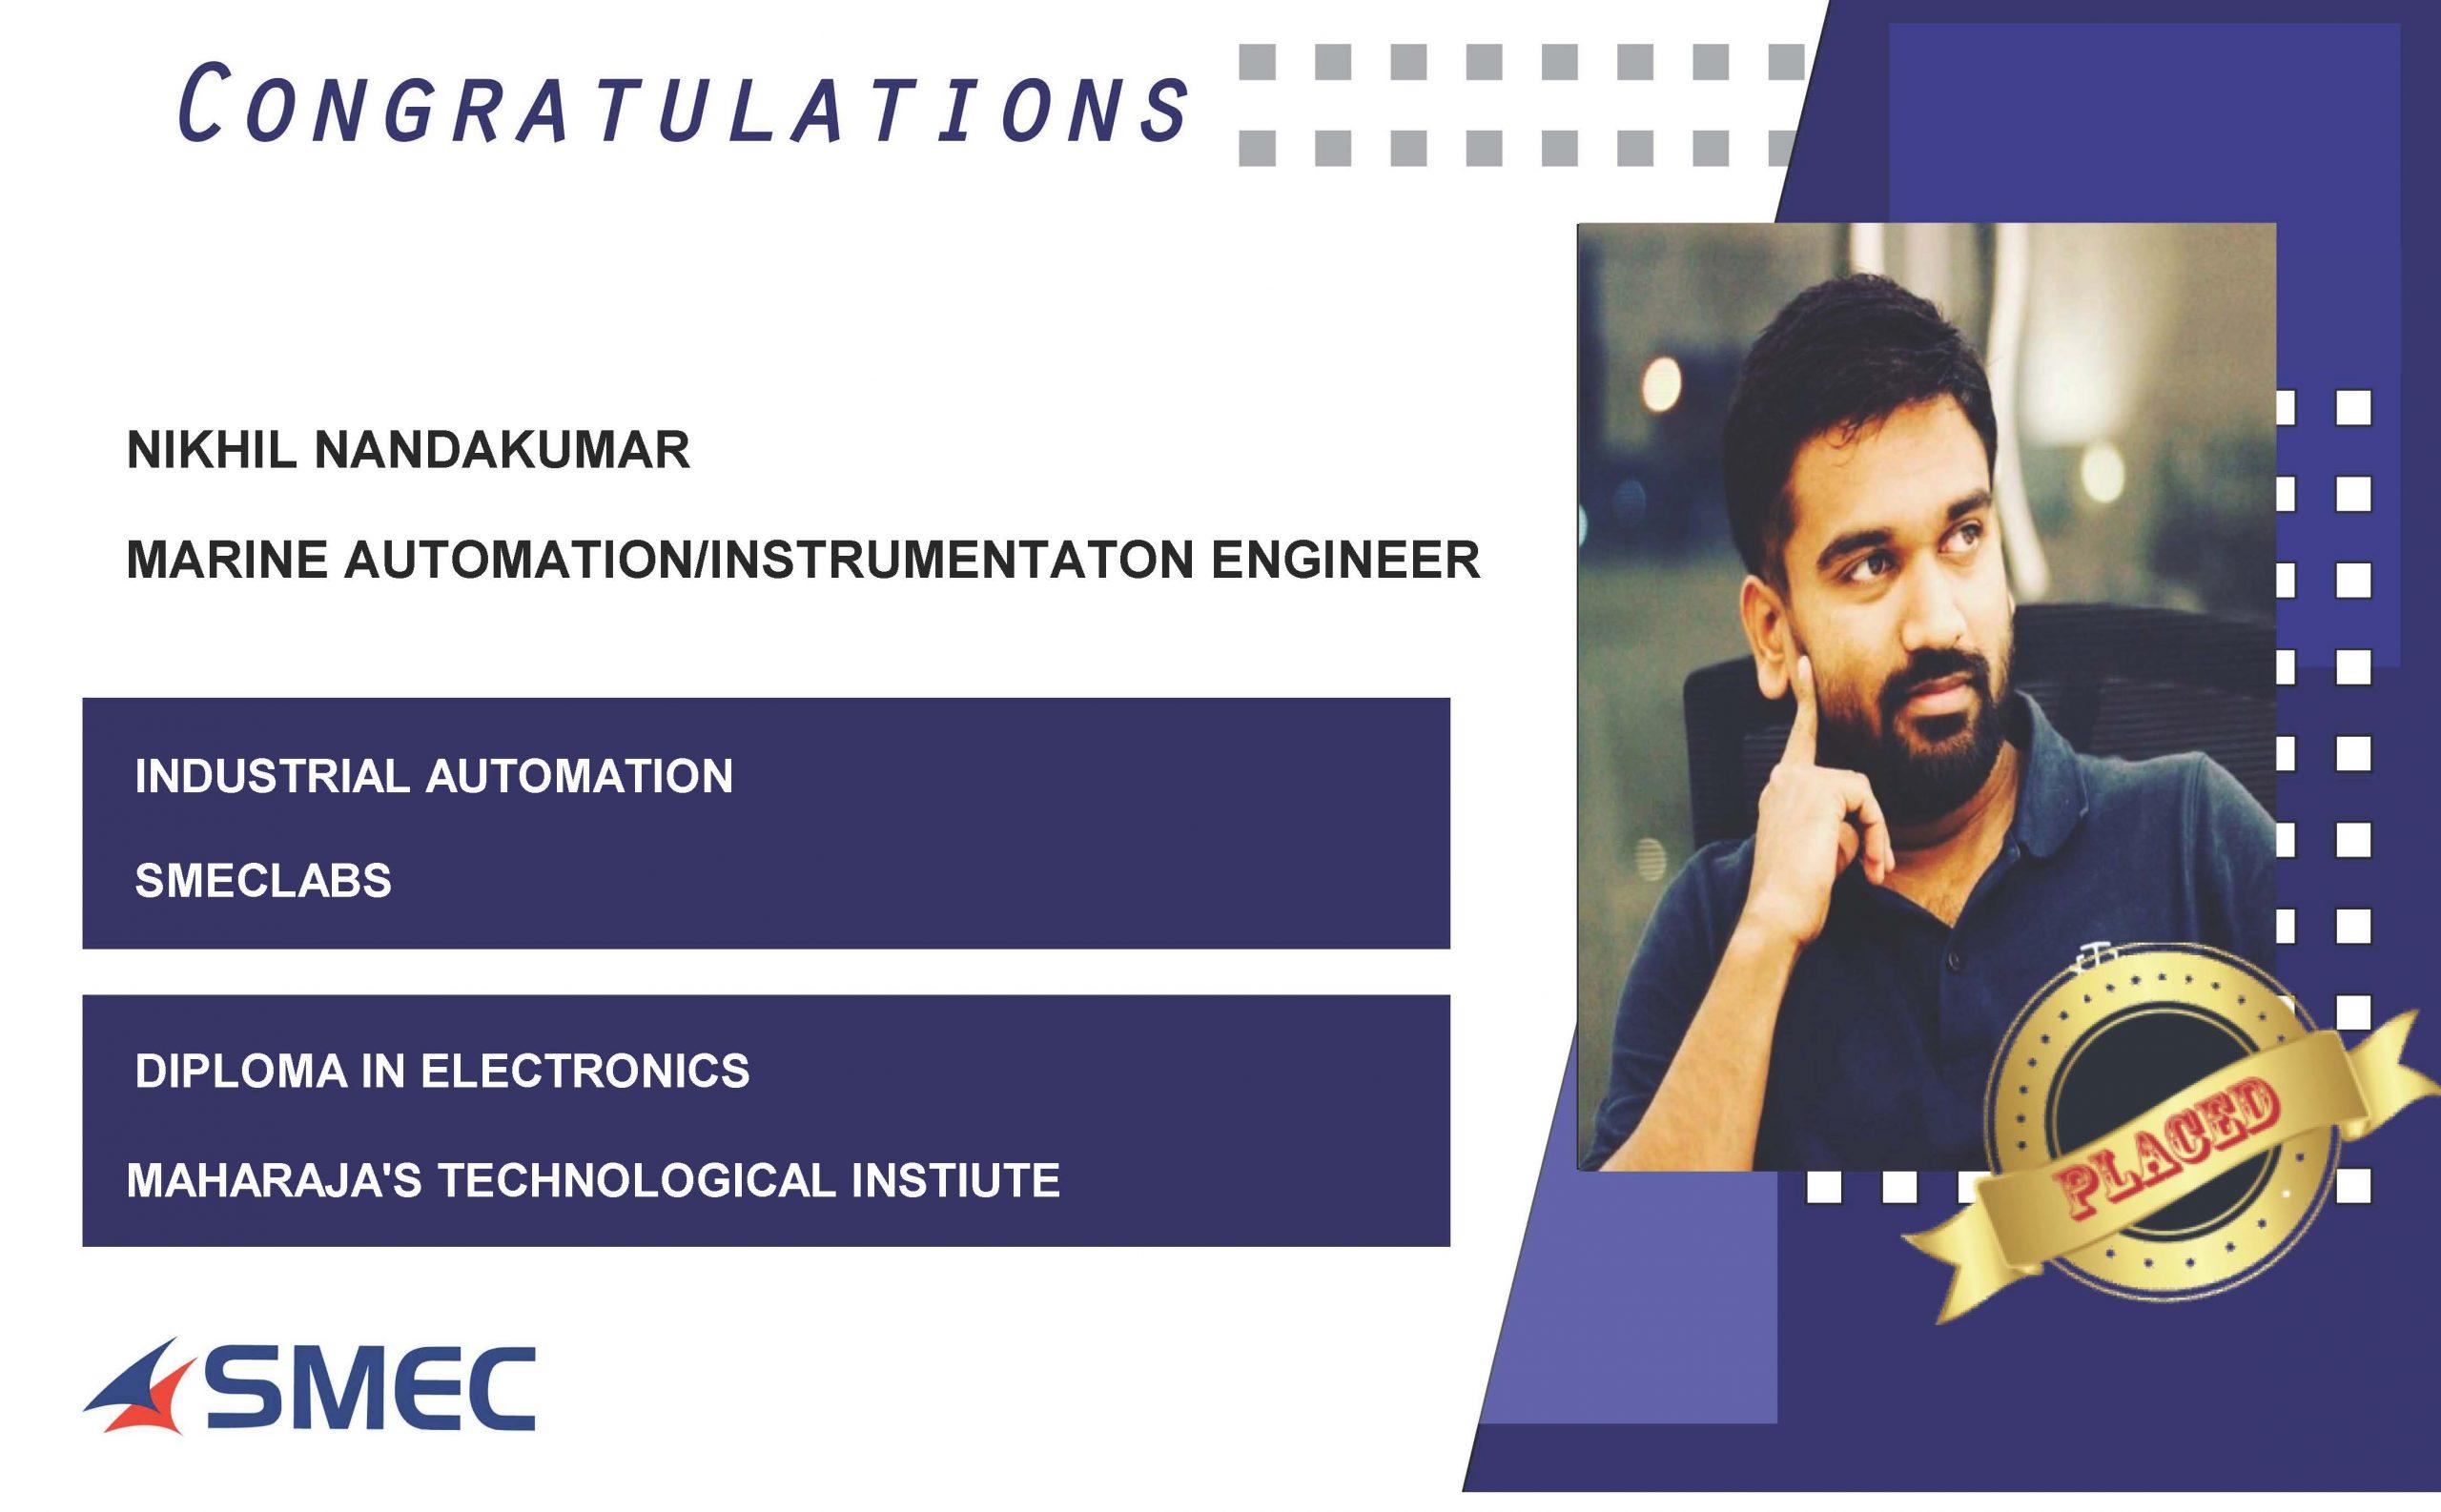 MARINE AUTOMATION/INSTRUMENTATION ENGINEER JOBS-Nikhil Nandakumar